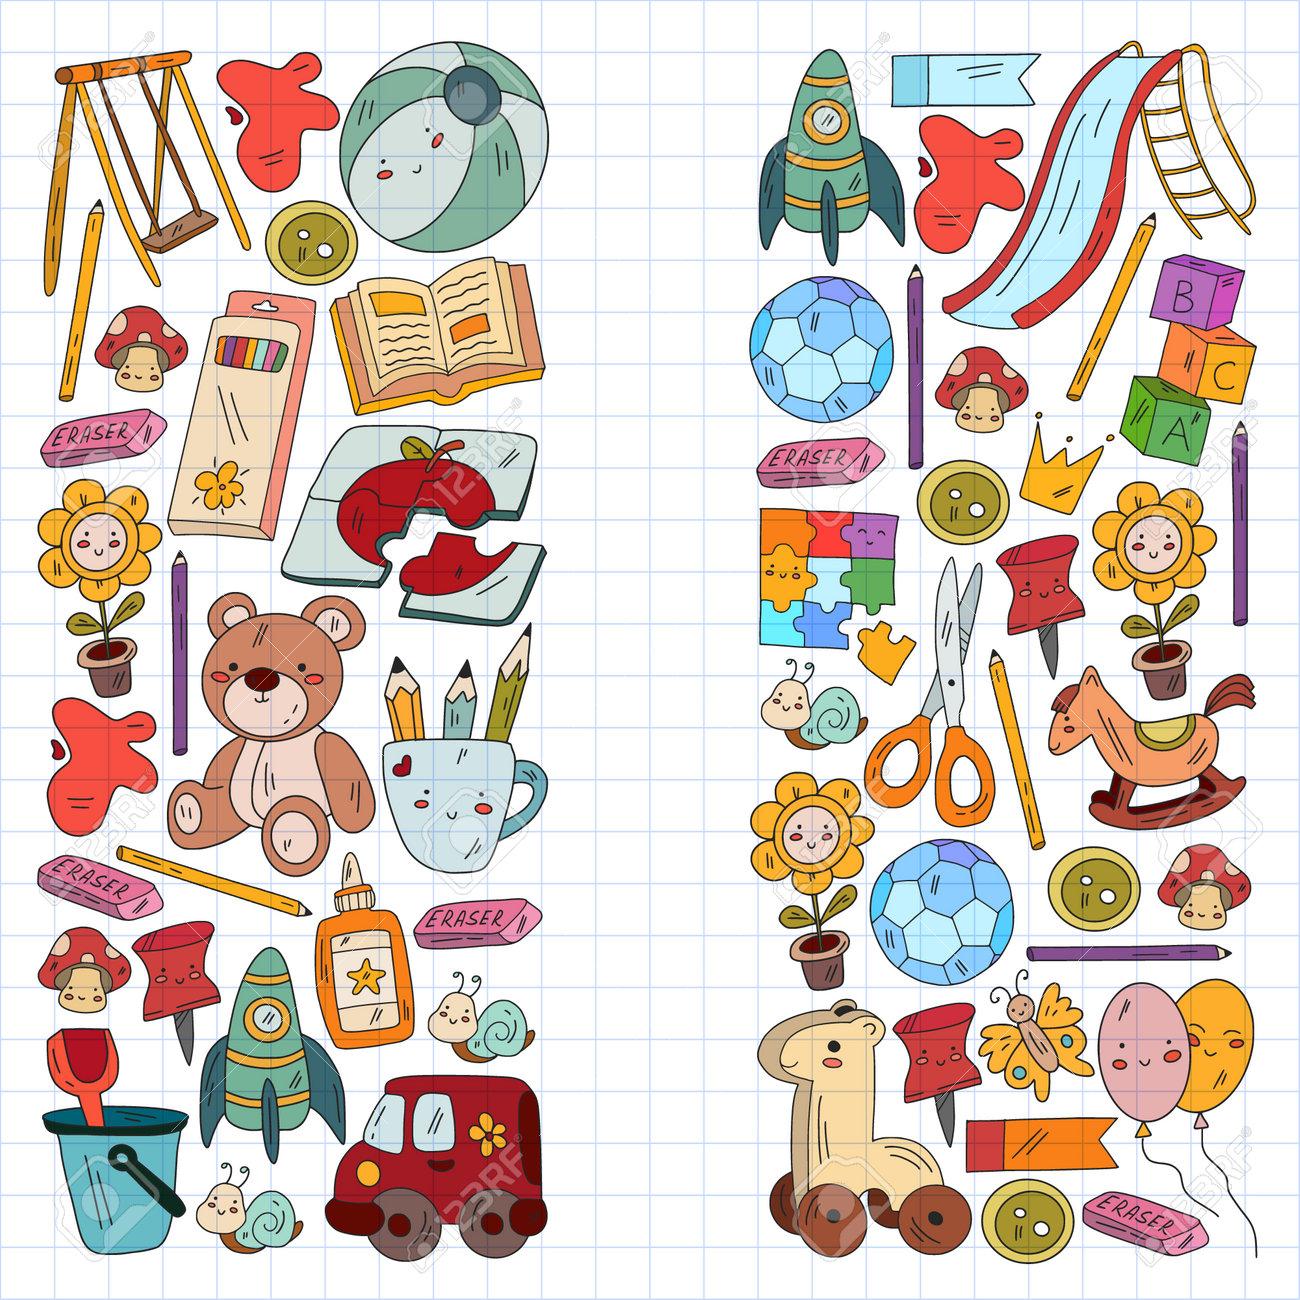 Children play with toys in the kindergarten. Kids playground. Education, creativity, imagination. - 173369609